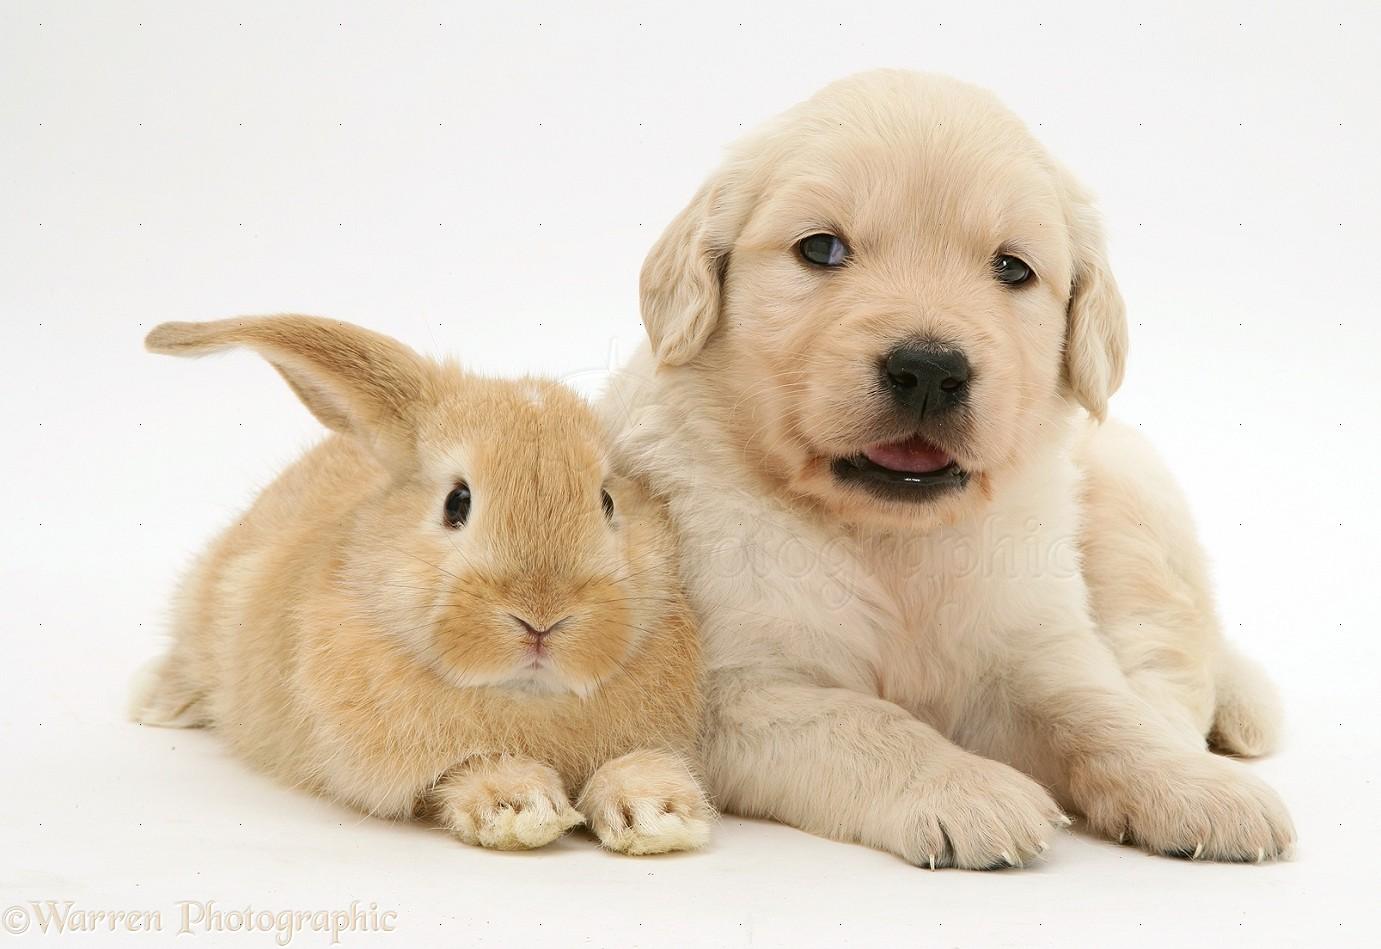 Cute Baby Golden Retriever Puppies With golden retriever pup